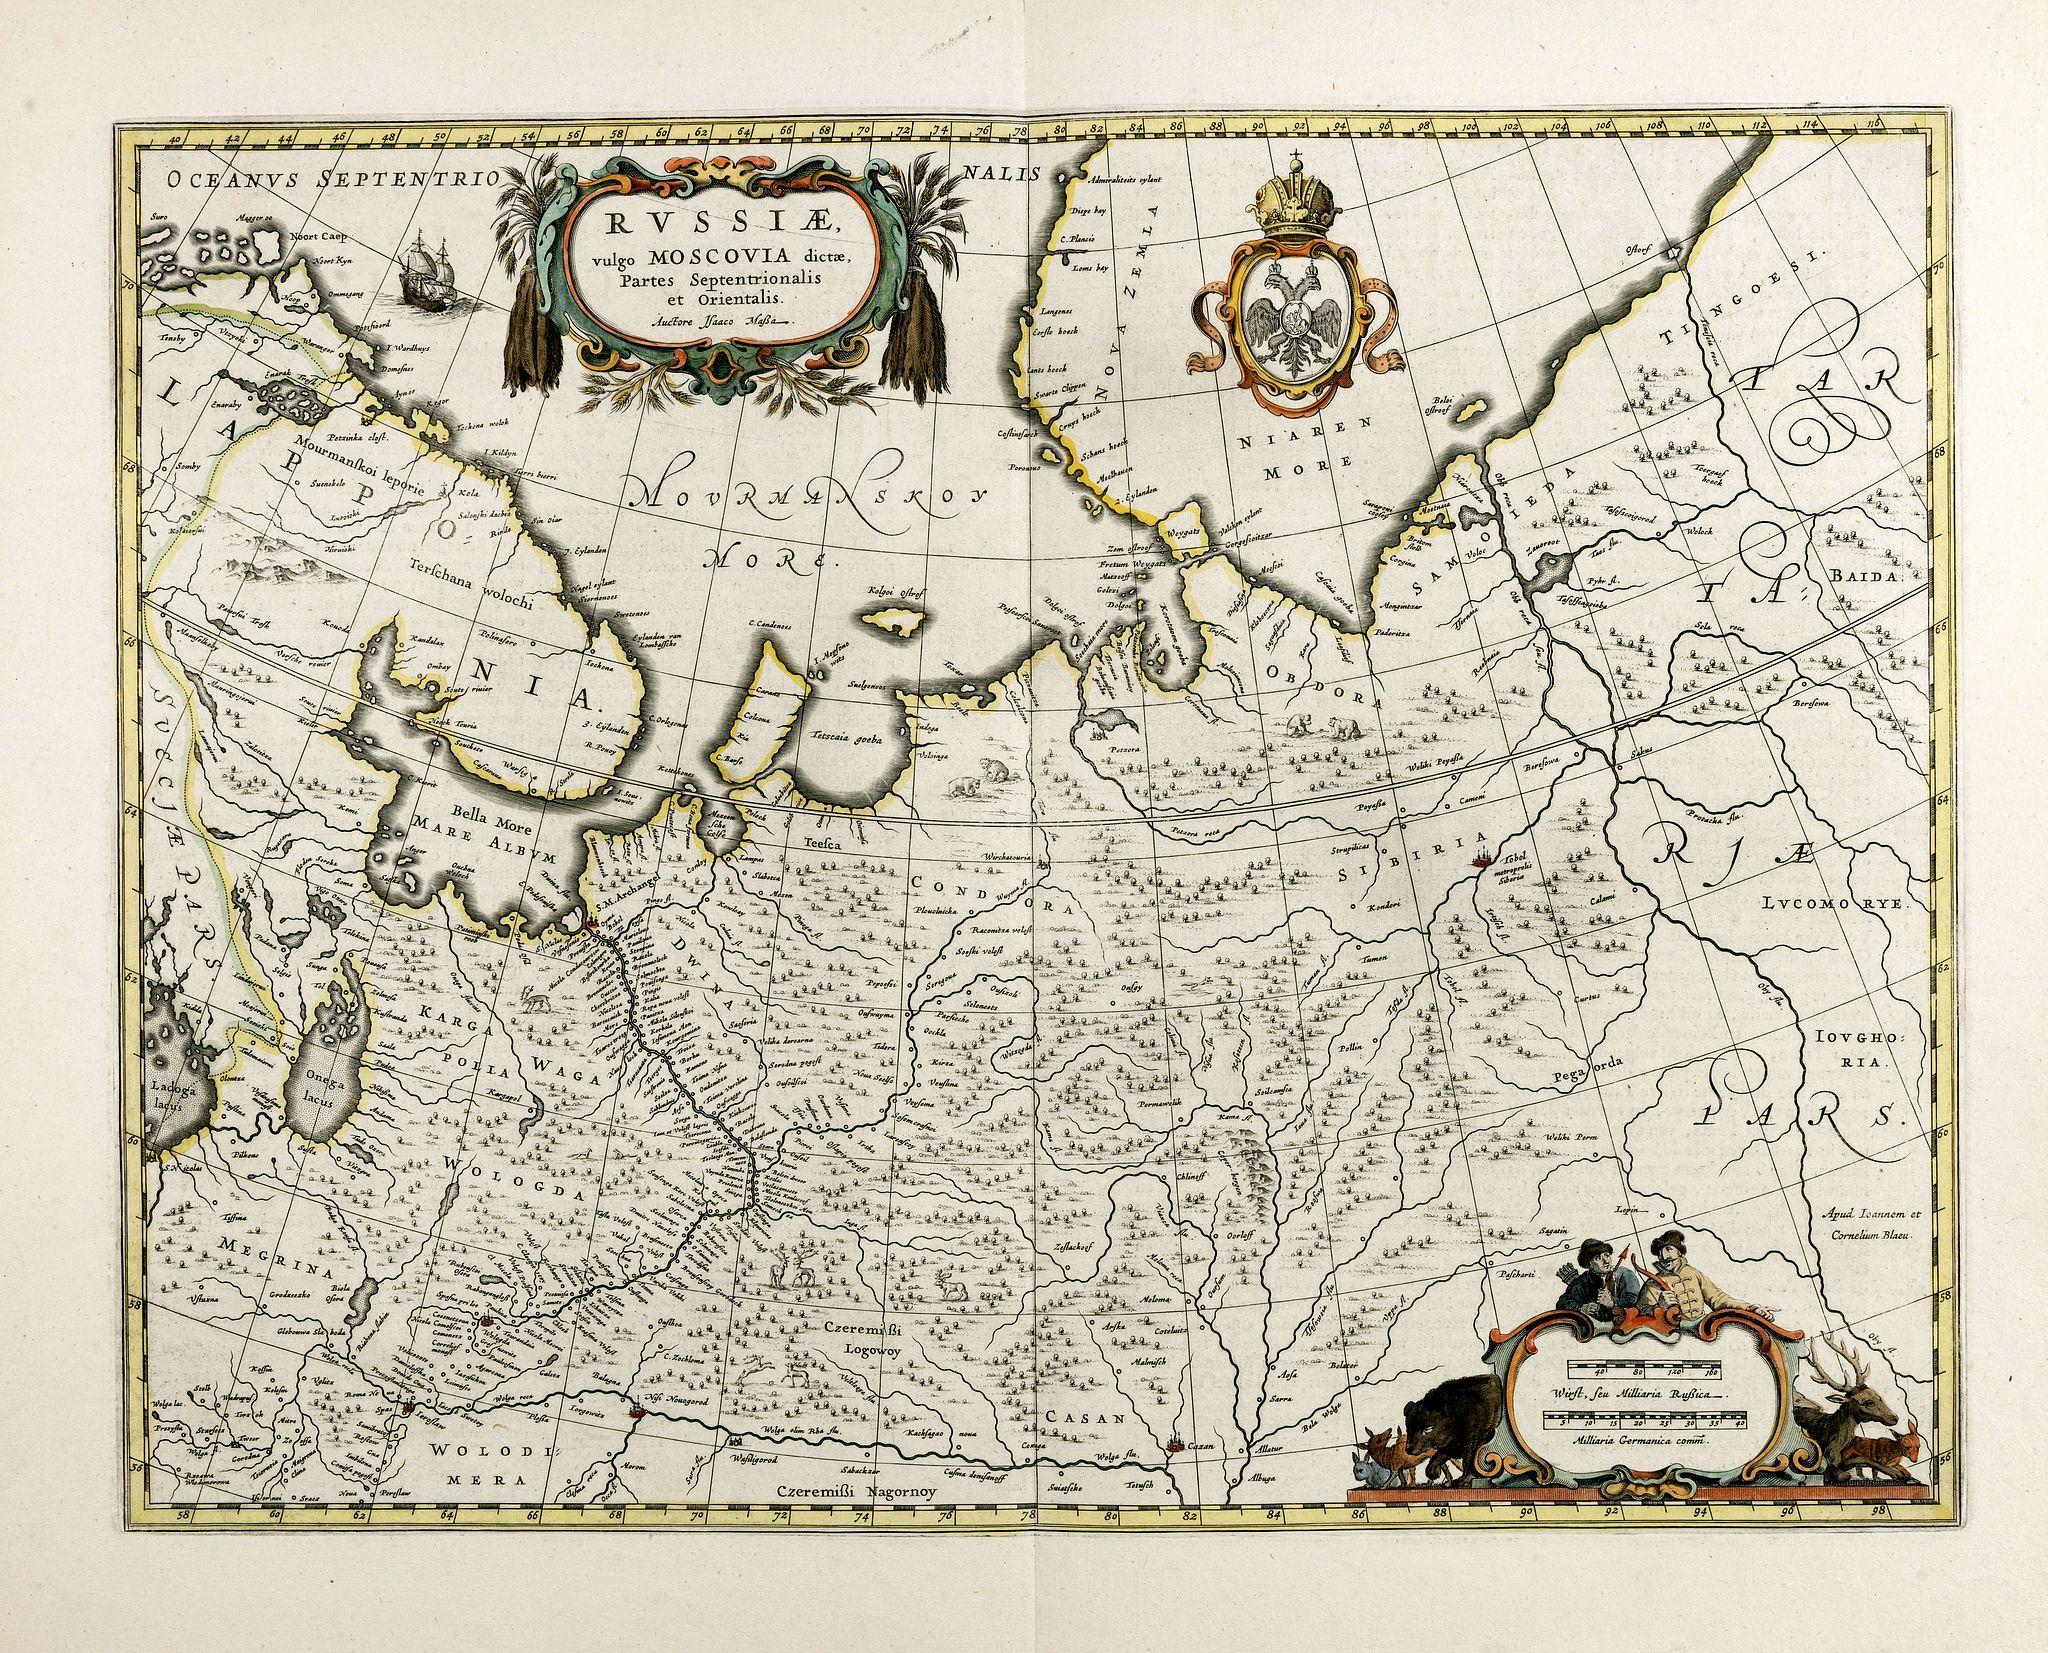 BLAEU, J. -  Russiae, vulgo moscoviae dictae, partes septentrionalis et orientalis.